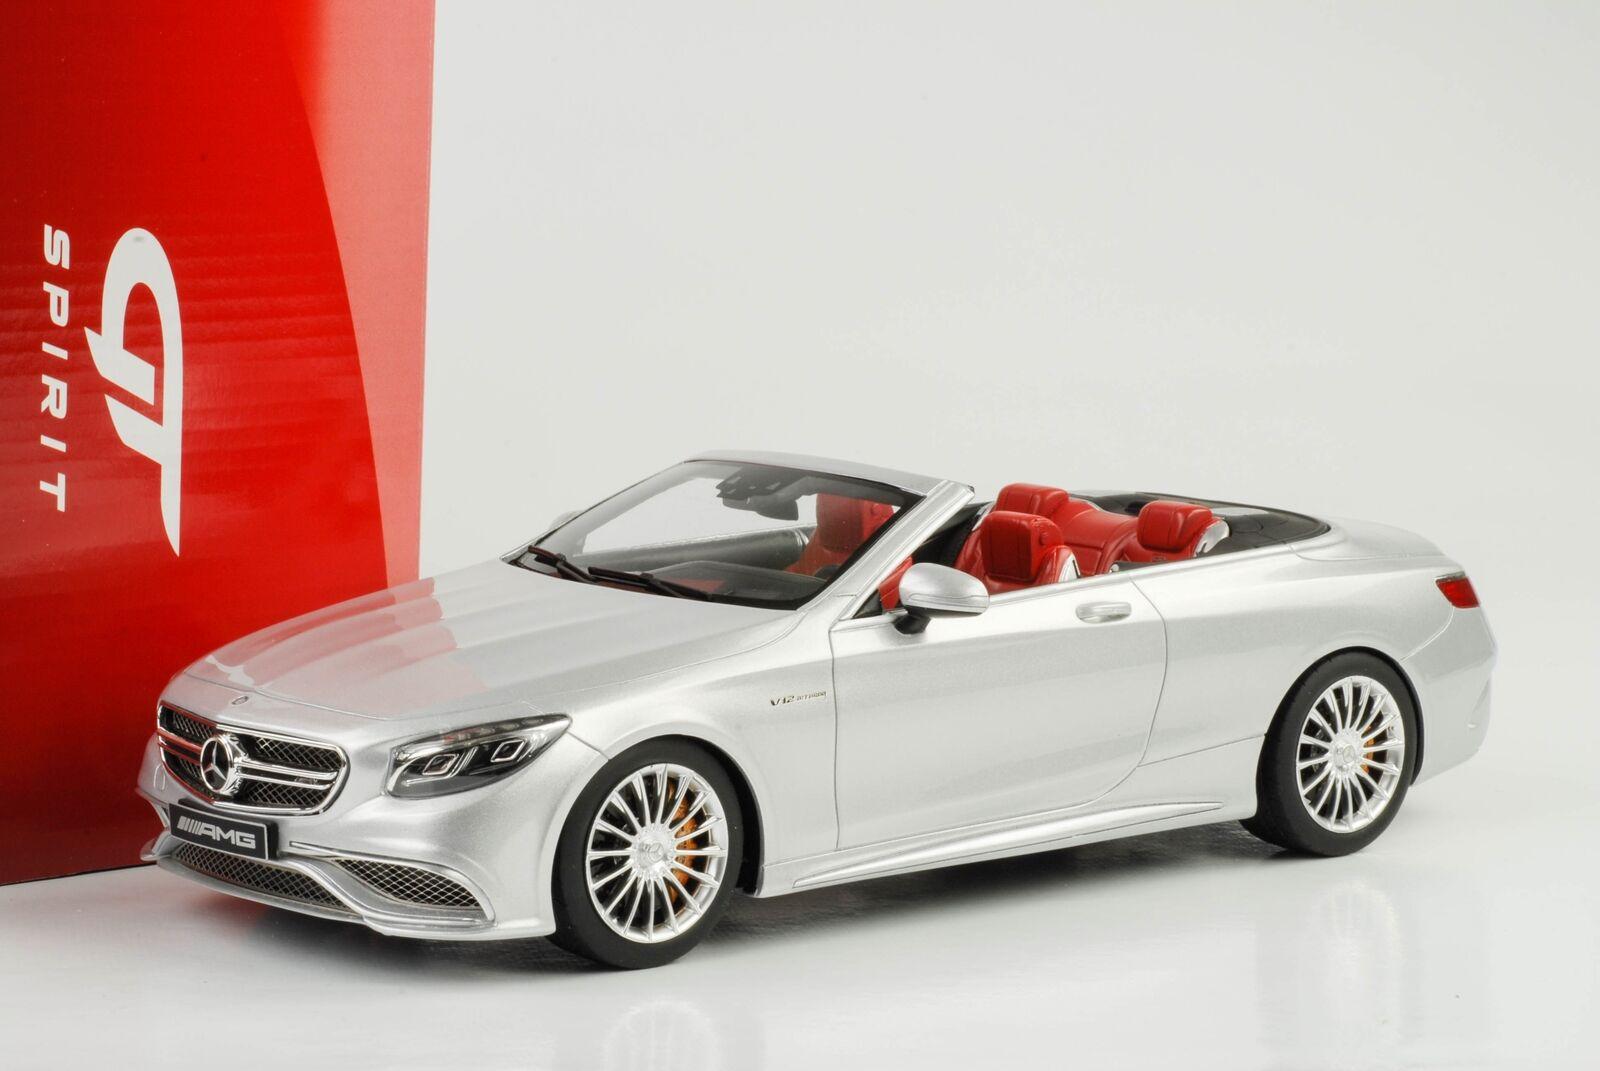 Mercedes - benz amg s 65 v12 cabrio 2017 cabriolet Silber 1,18 gt - geist gt764